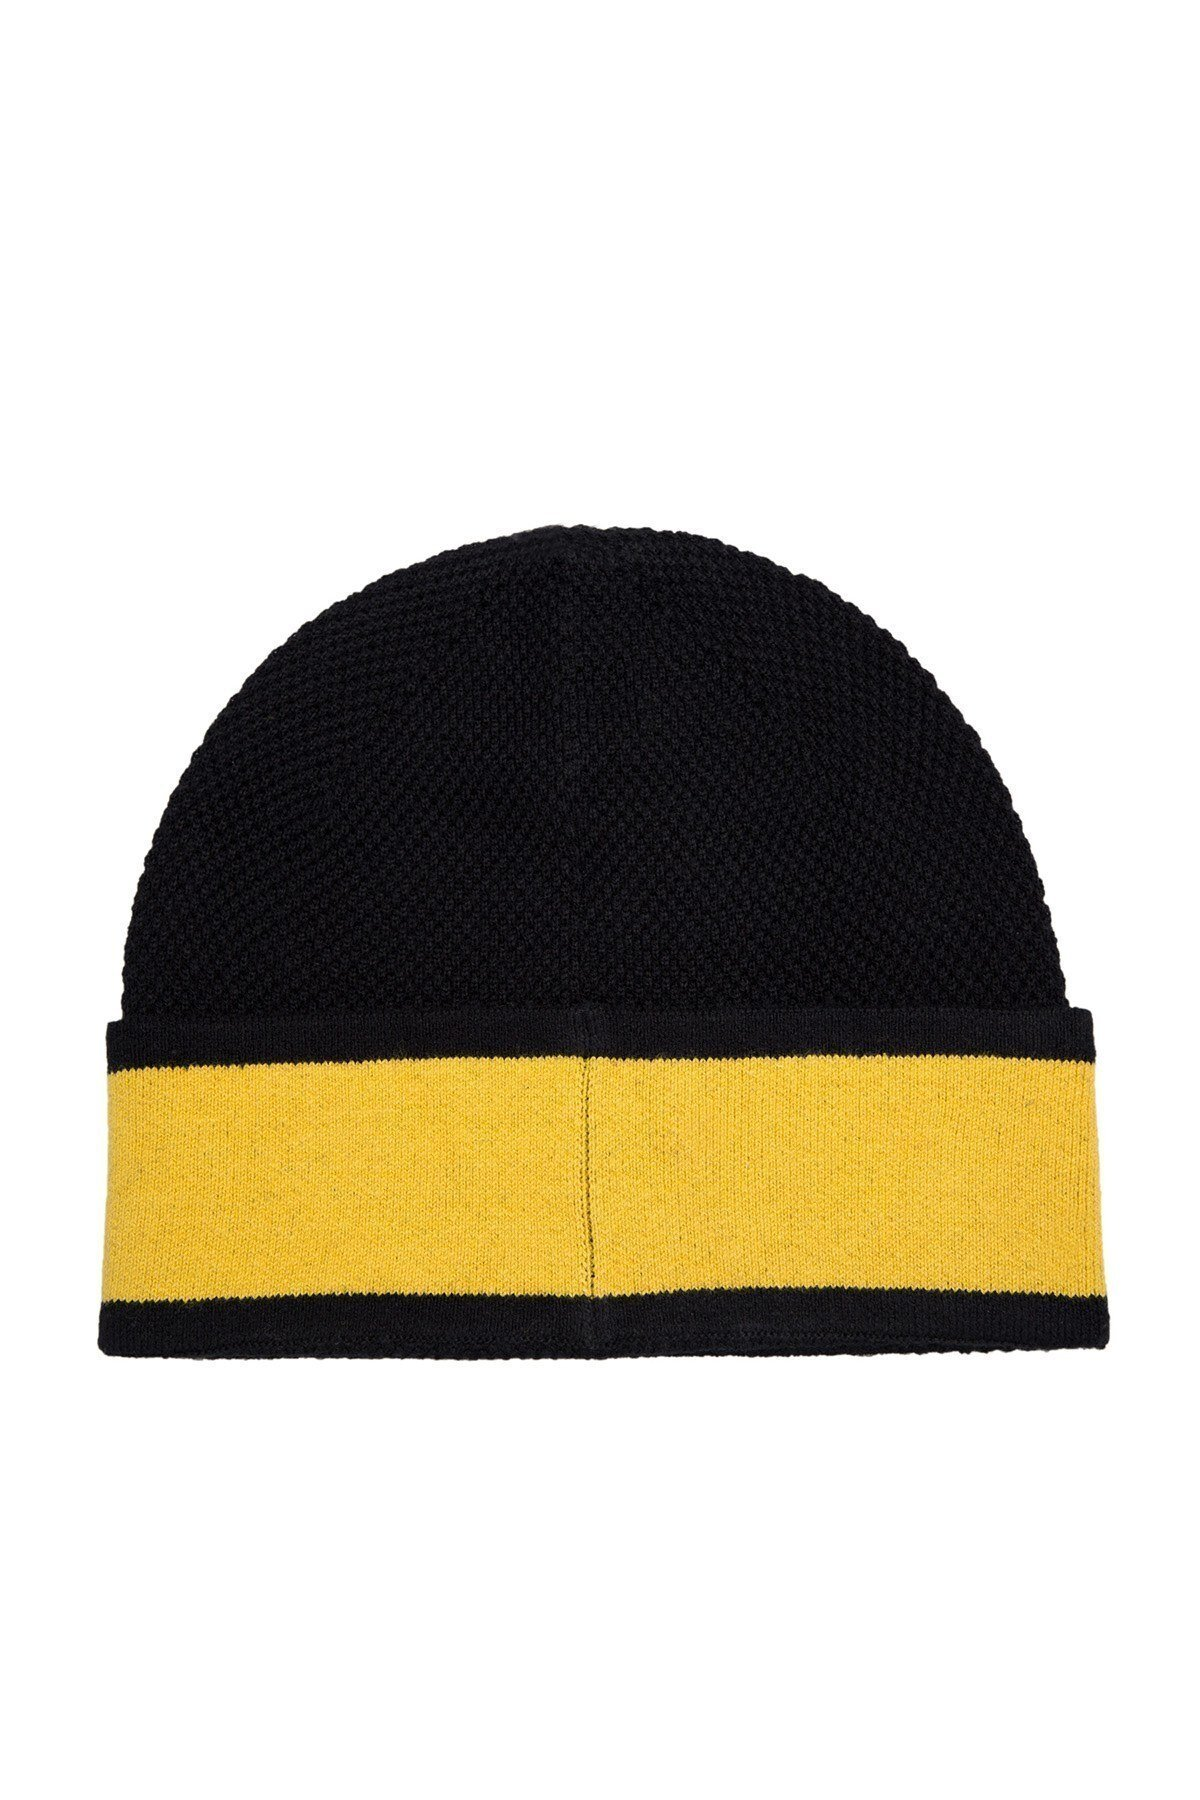 Armani Exchange Erkek Şapka 6GZ42A ZMS1Z 5276 SİYAH